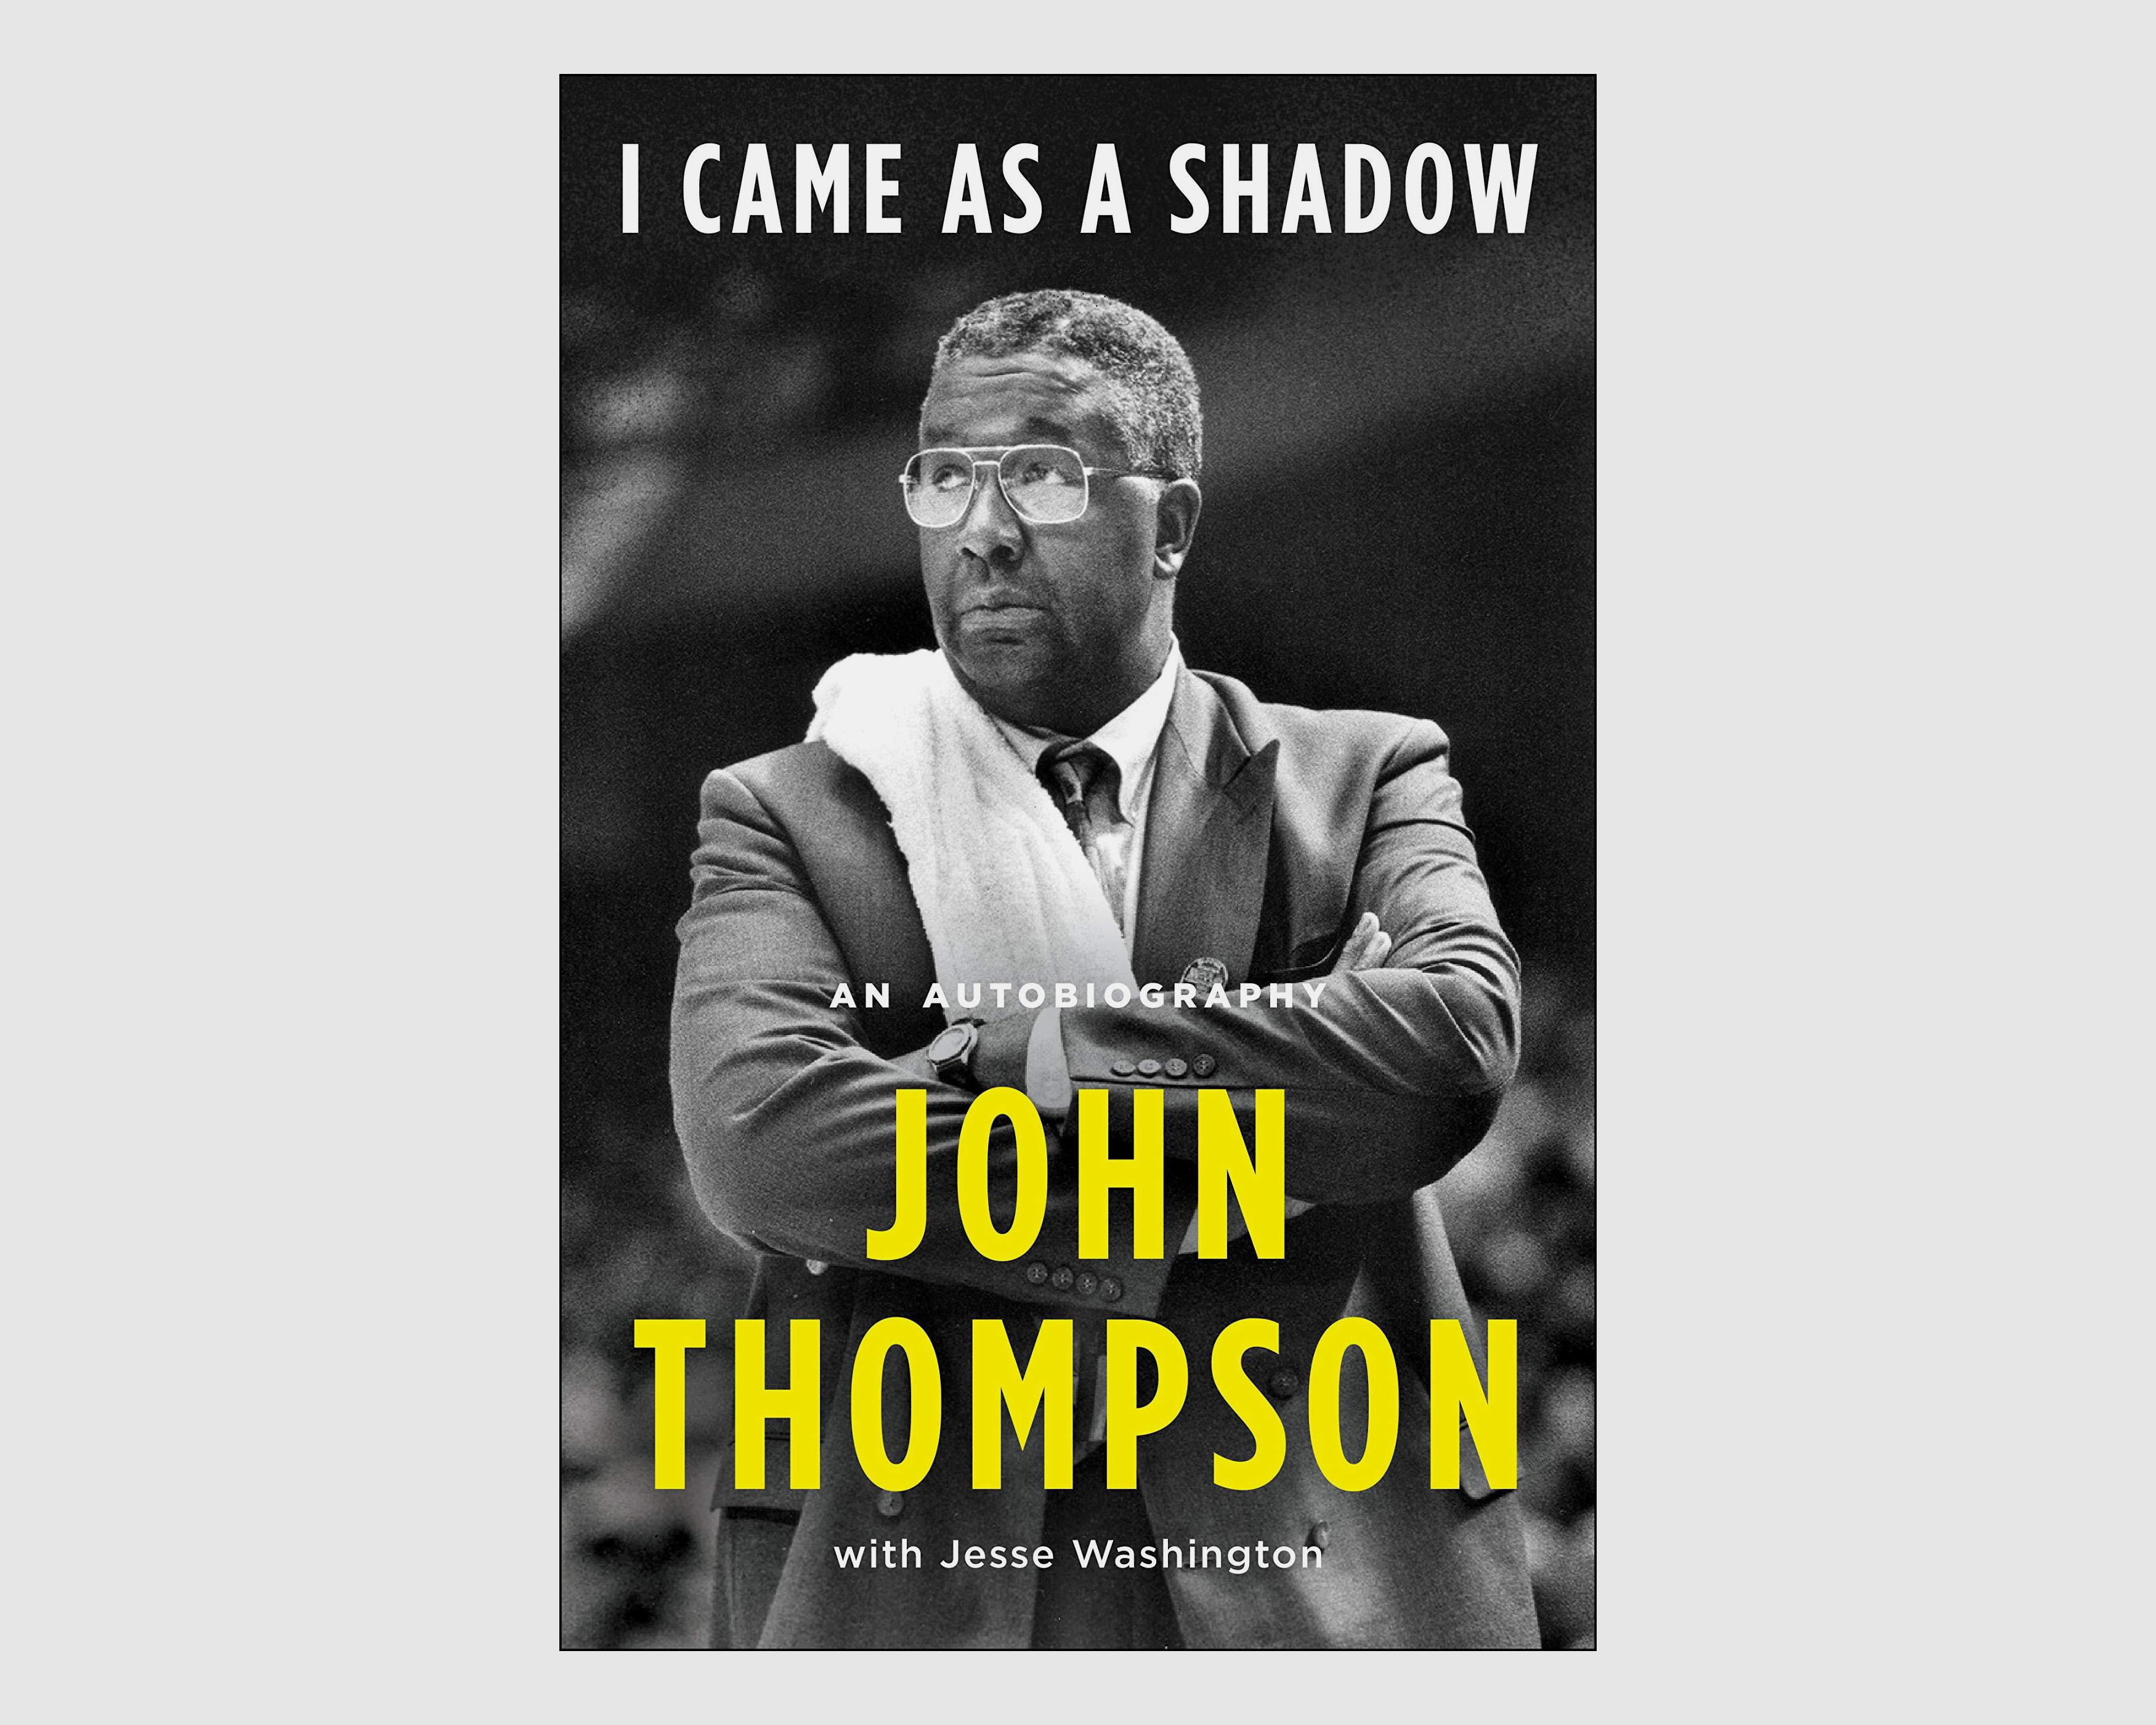 John Thompson's autobiography